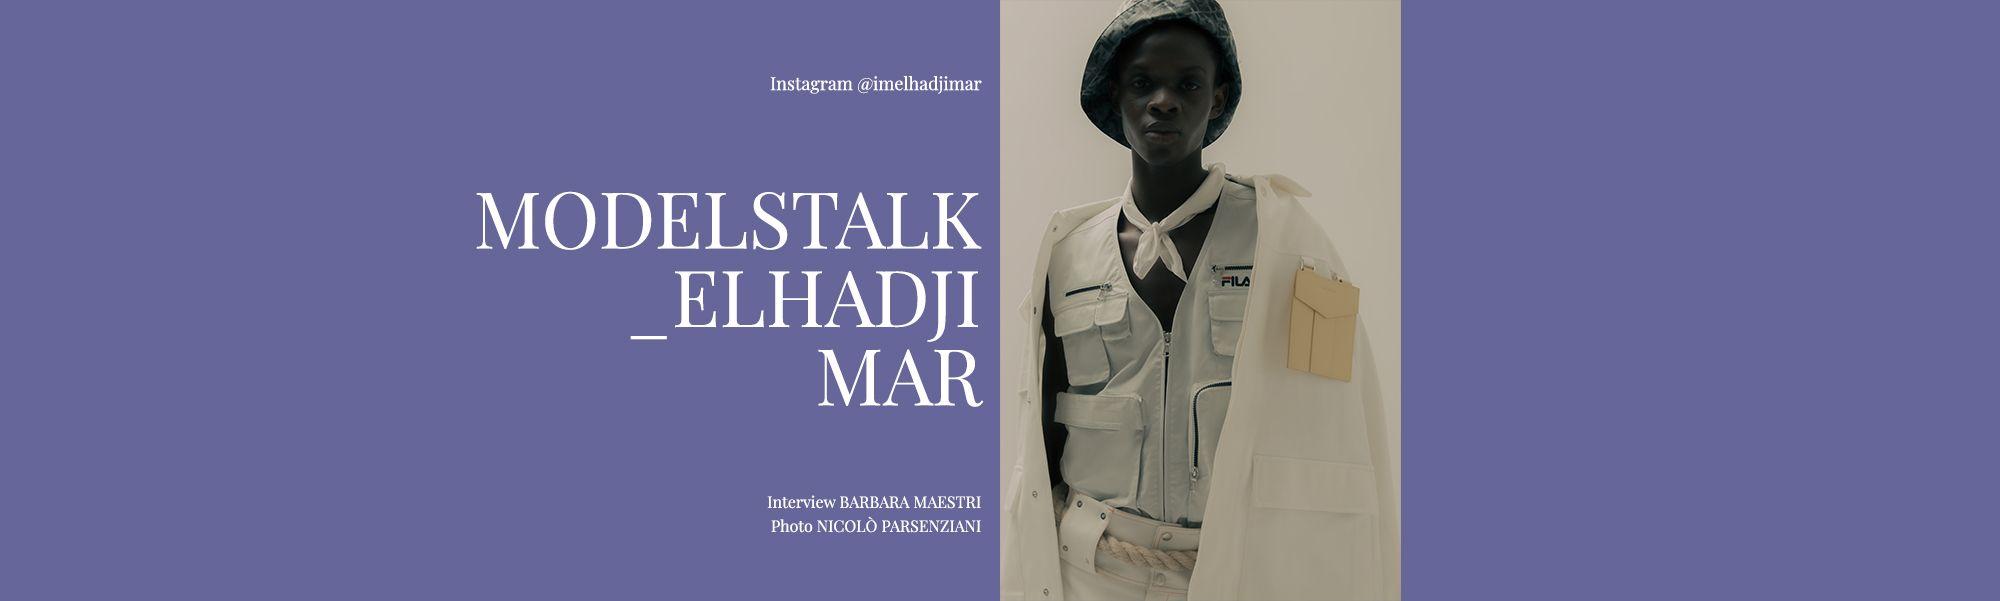 thegreatestmagazine-elhadji-mar-banner